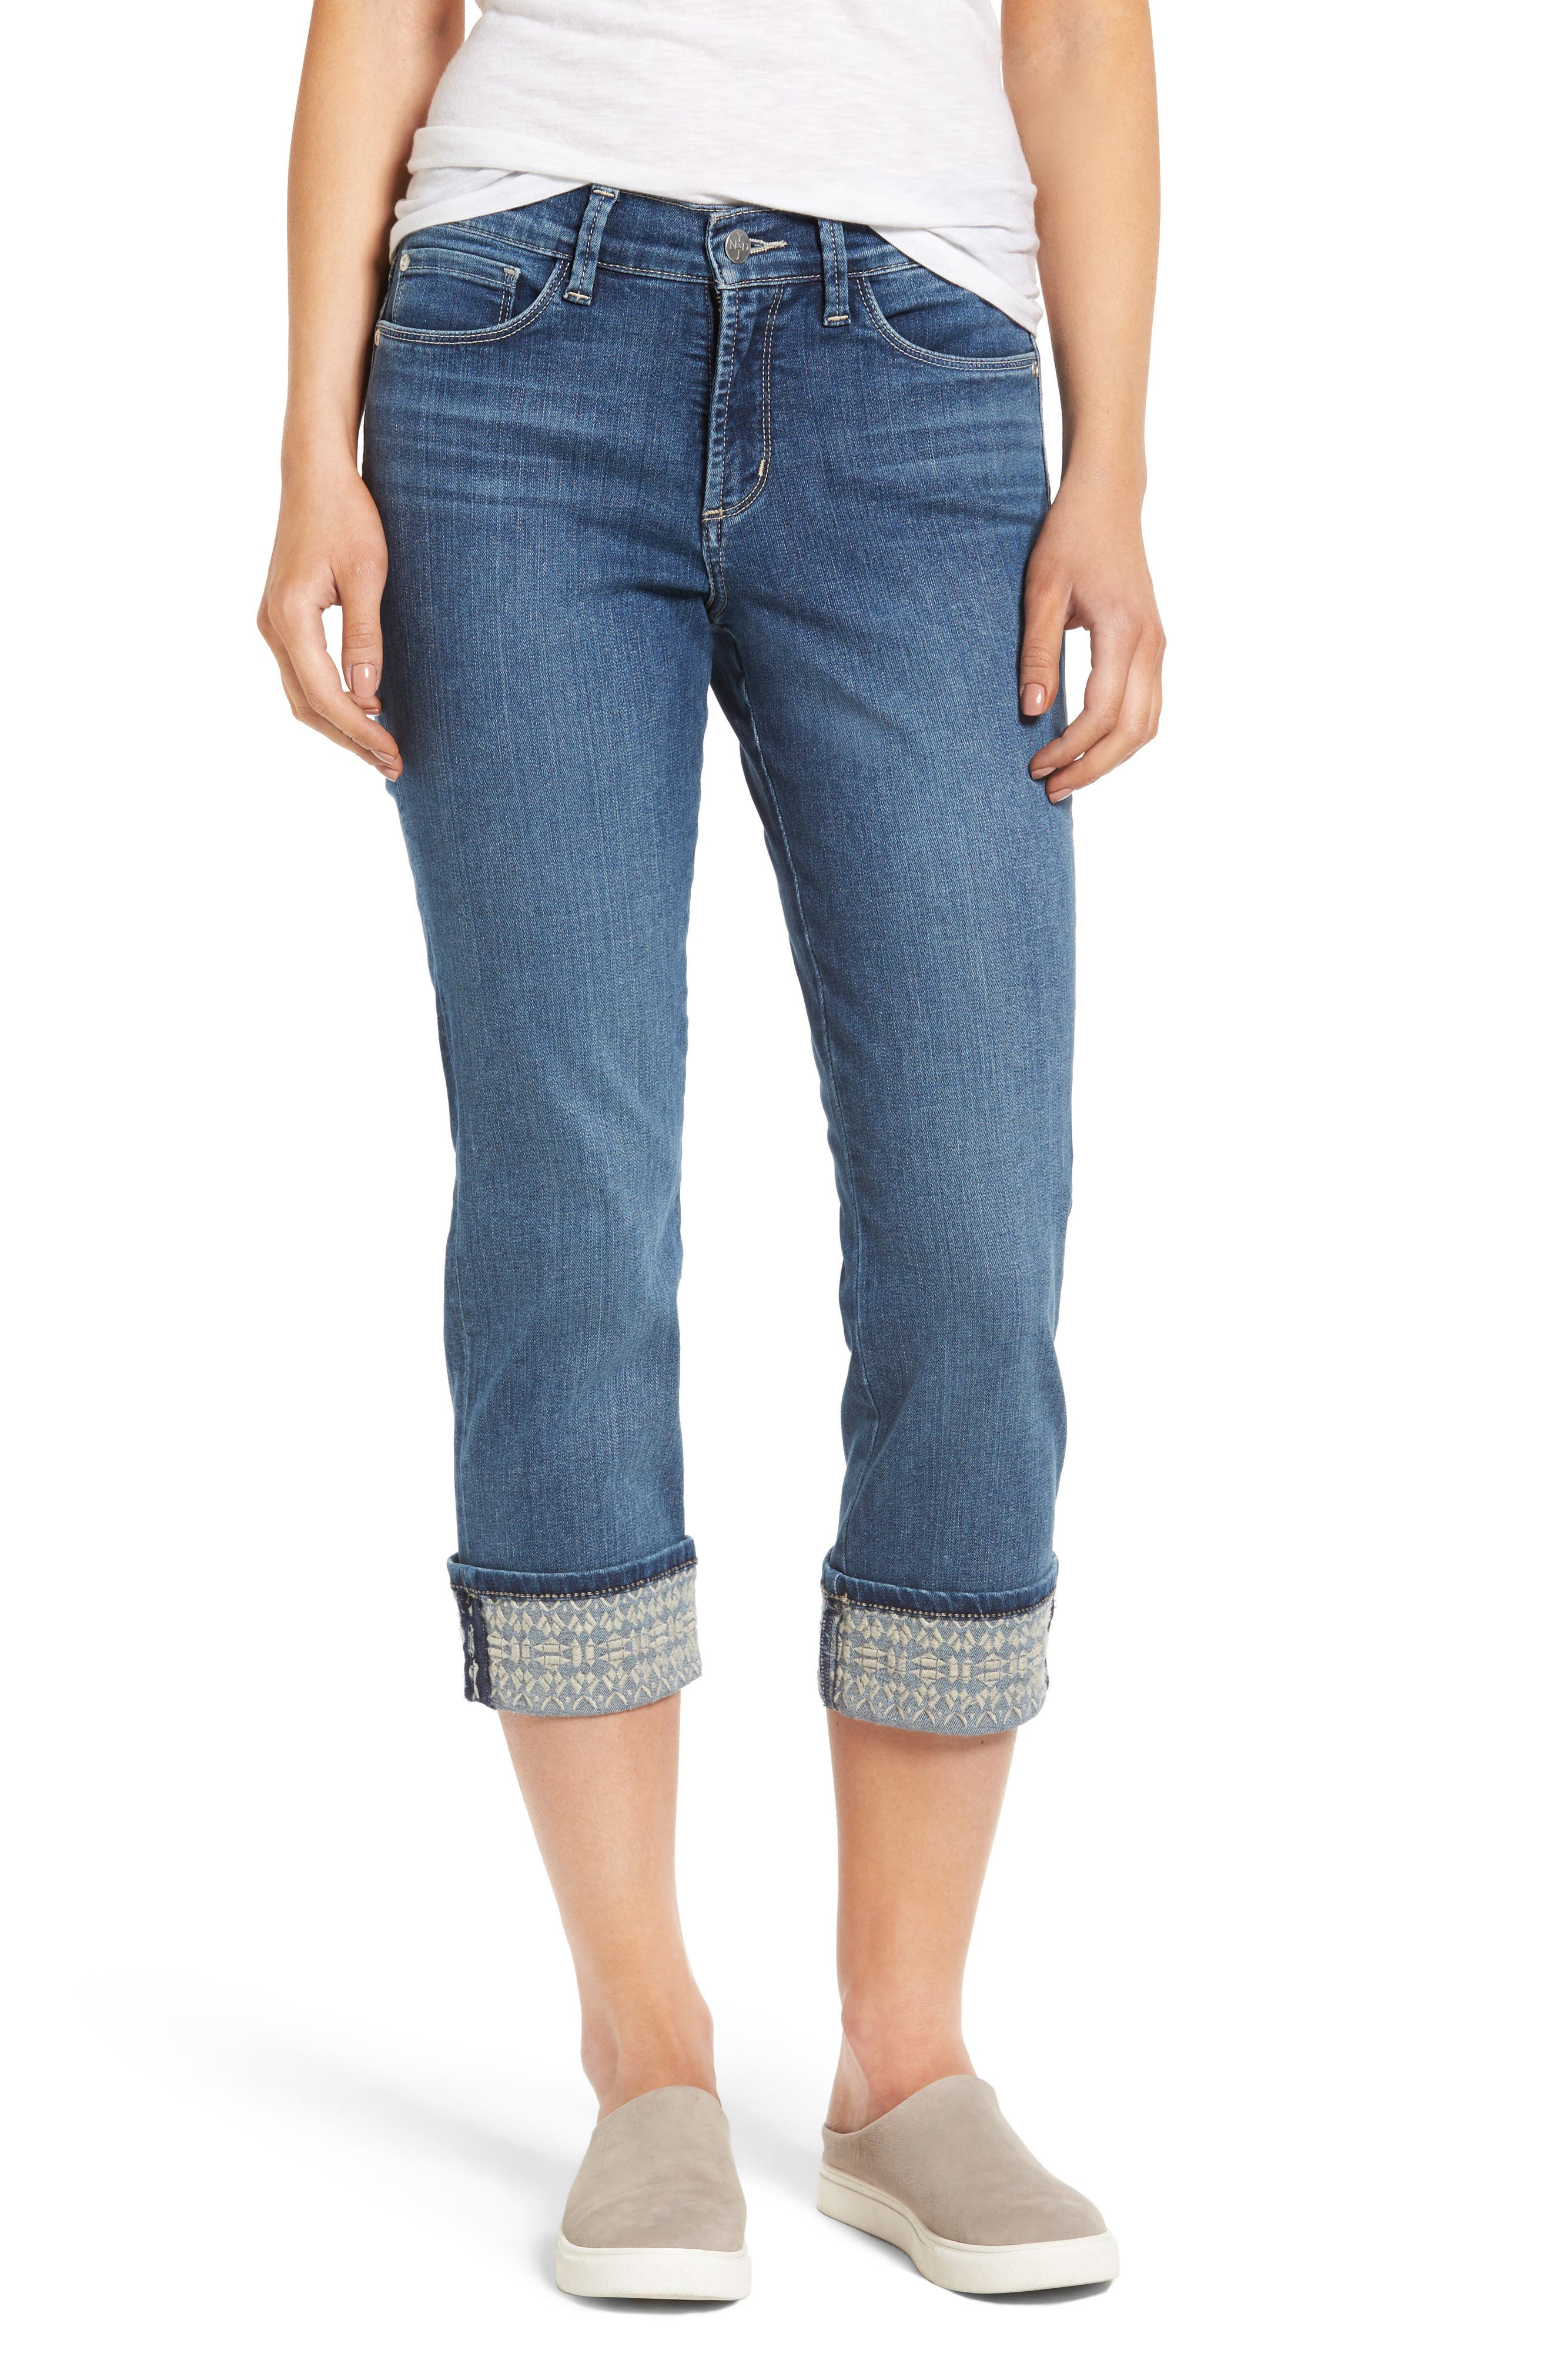 NYDJ Dayla Embroidered Wide Cuff Capri Jeans